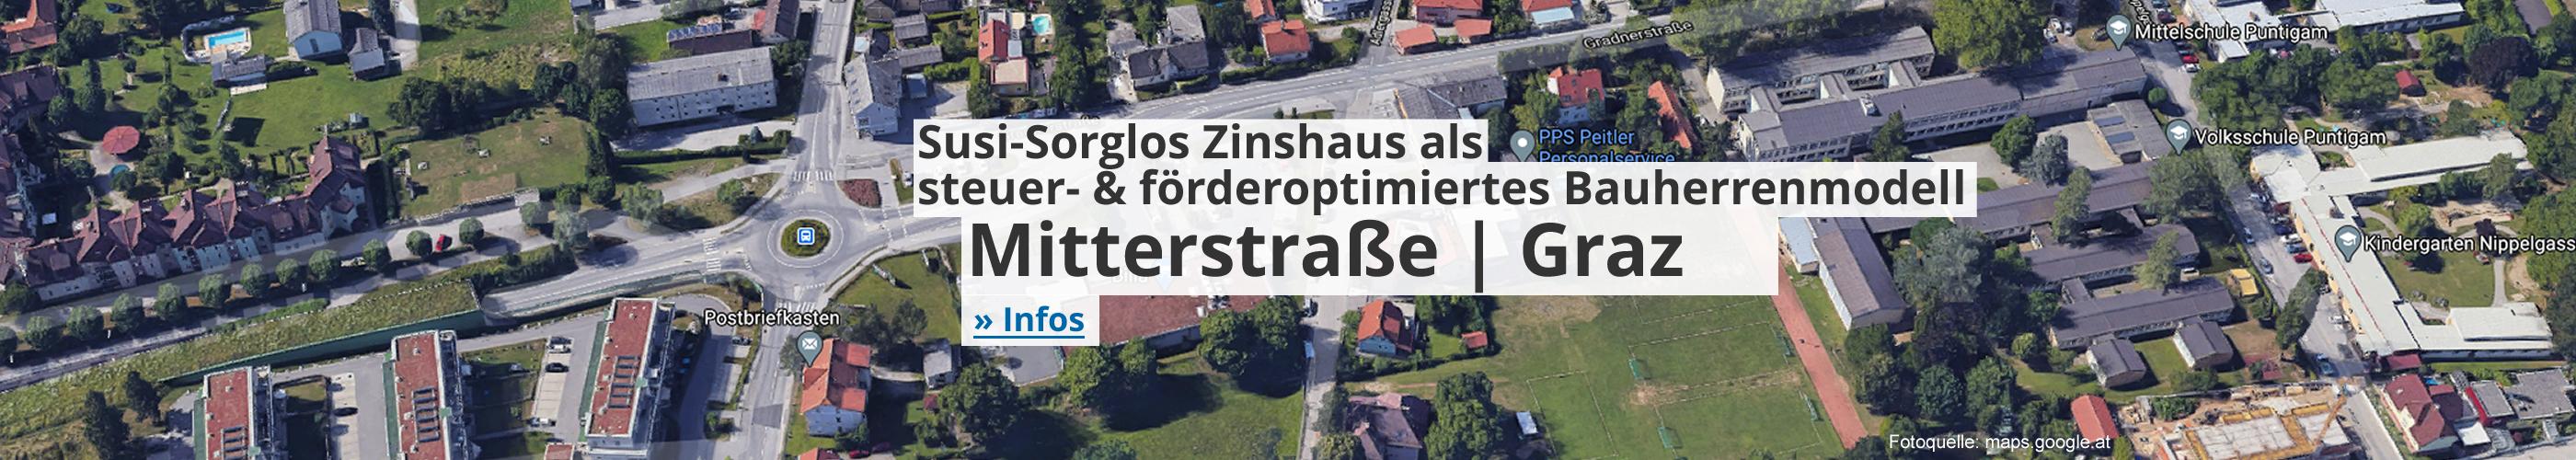 Susi-Sorglos Zinshaus als steuer- & förderoptimiertes Bauherrenmodell